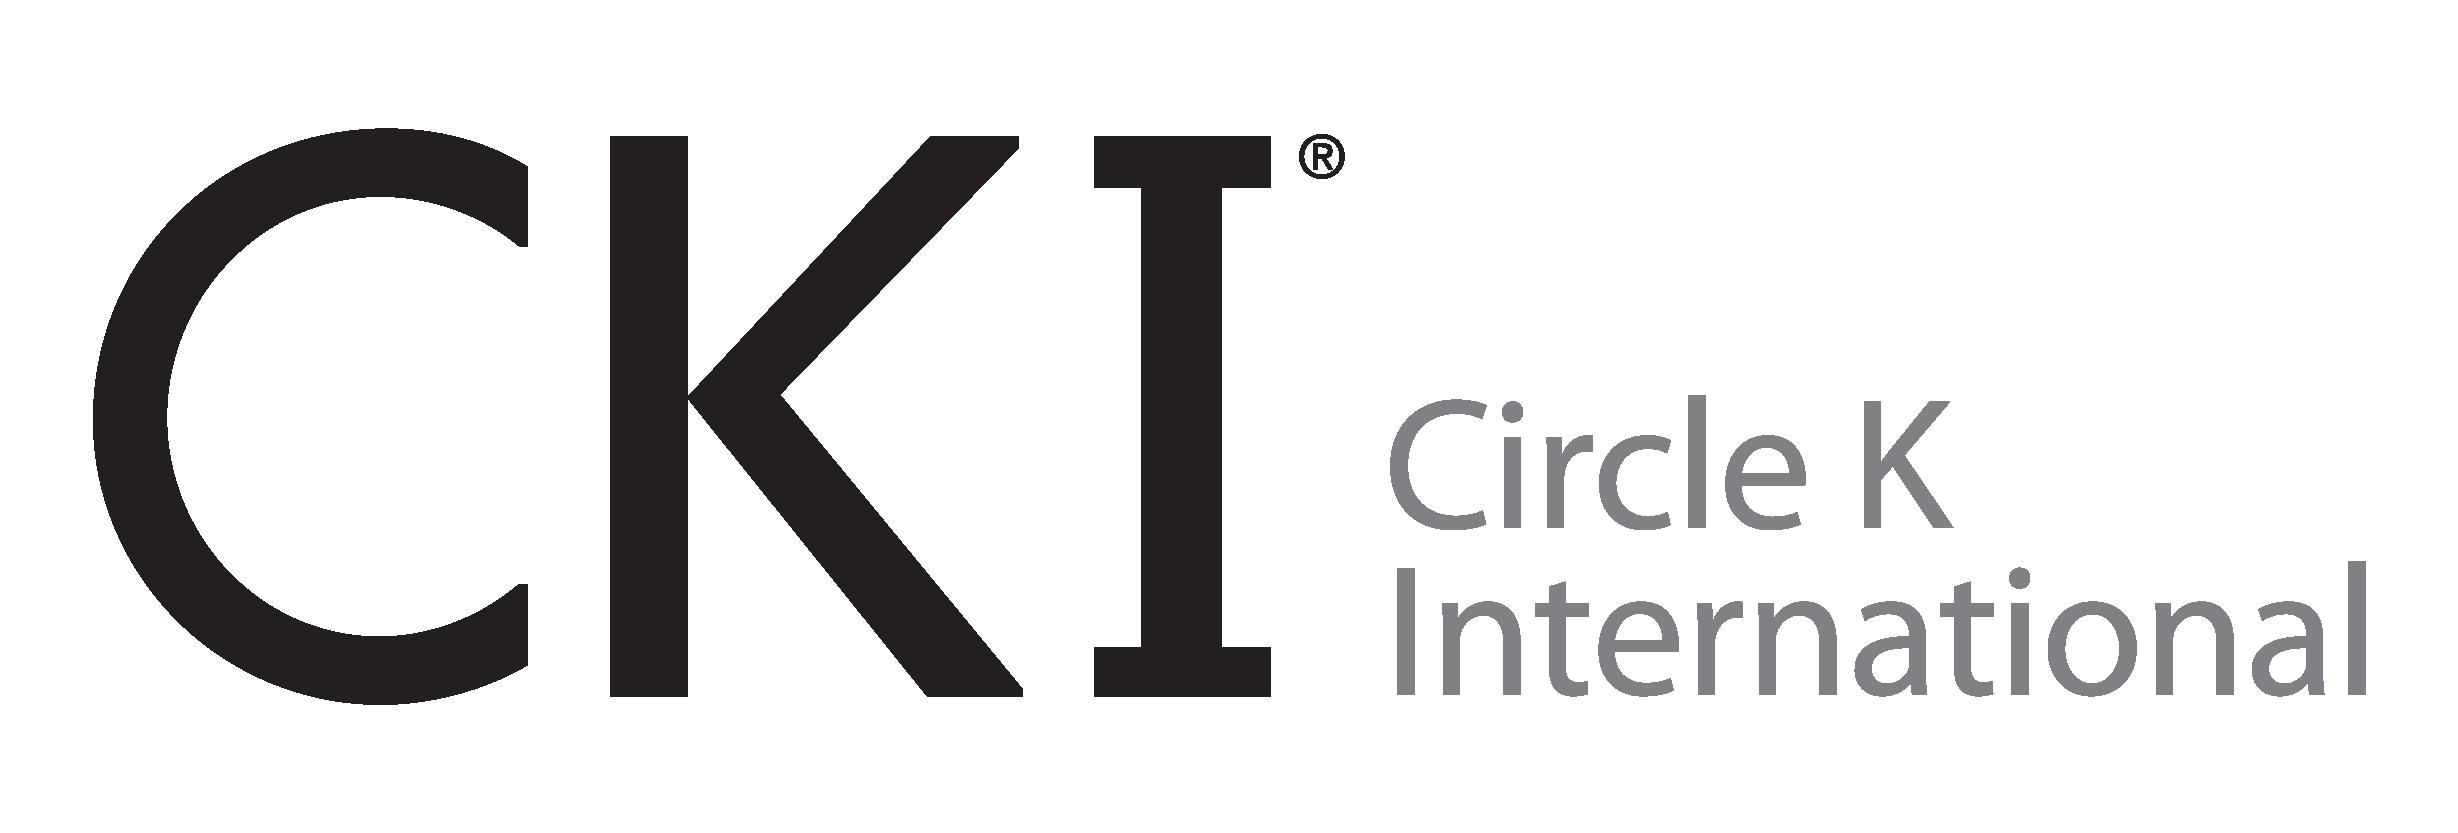 CNH Circle K   Serving Circle K clubs in CA, NV, & HI